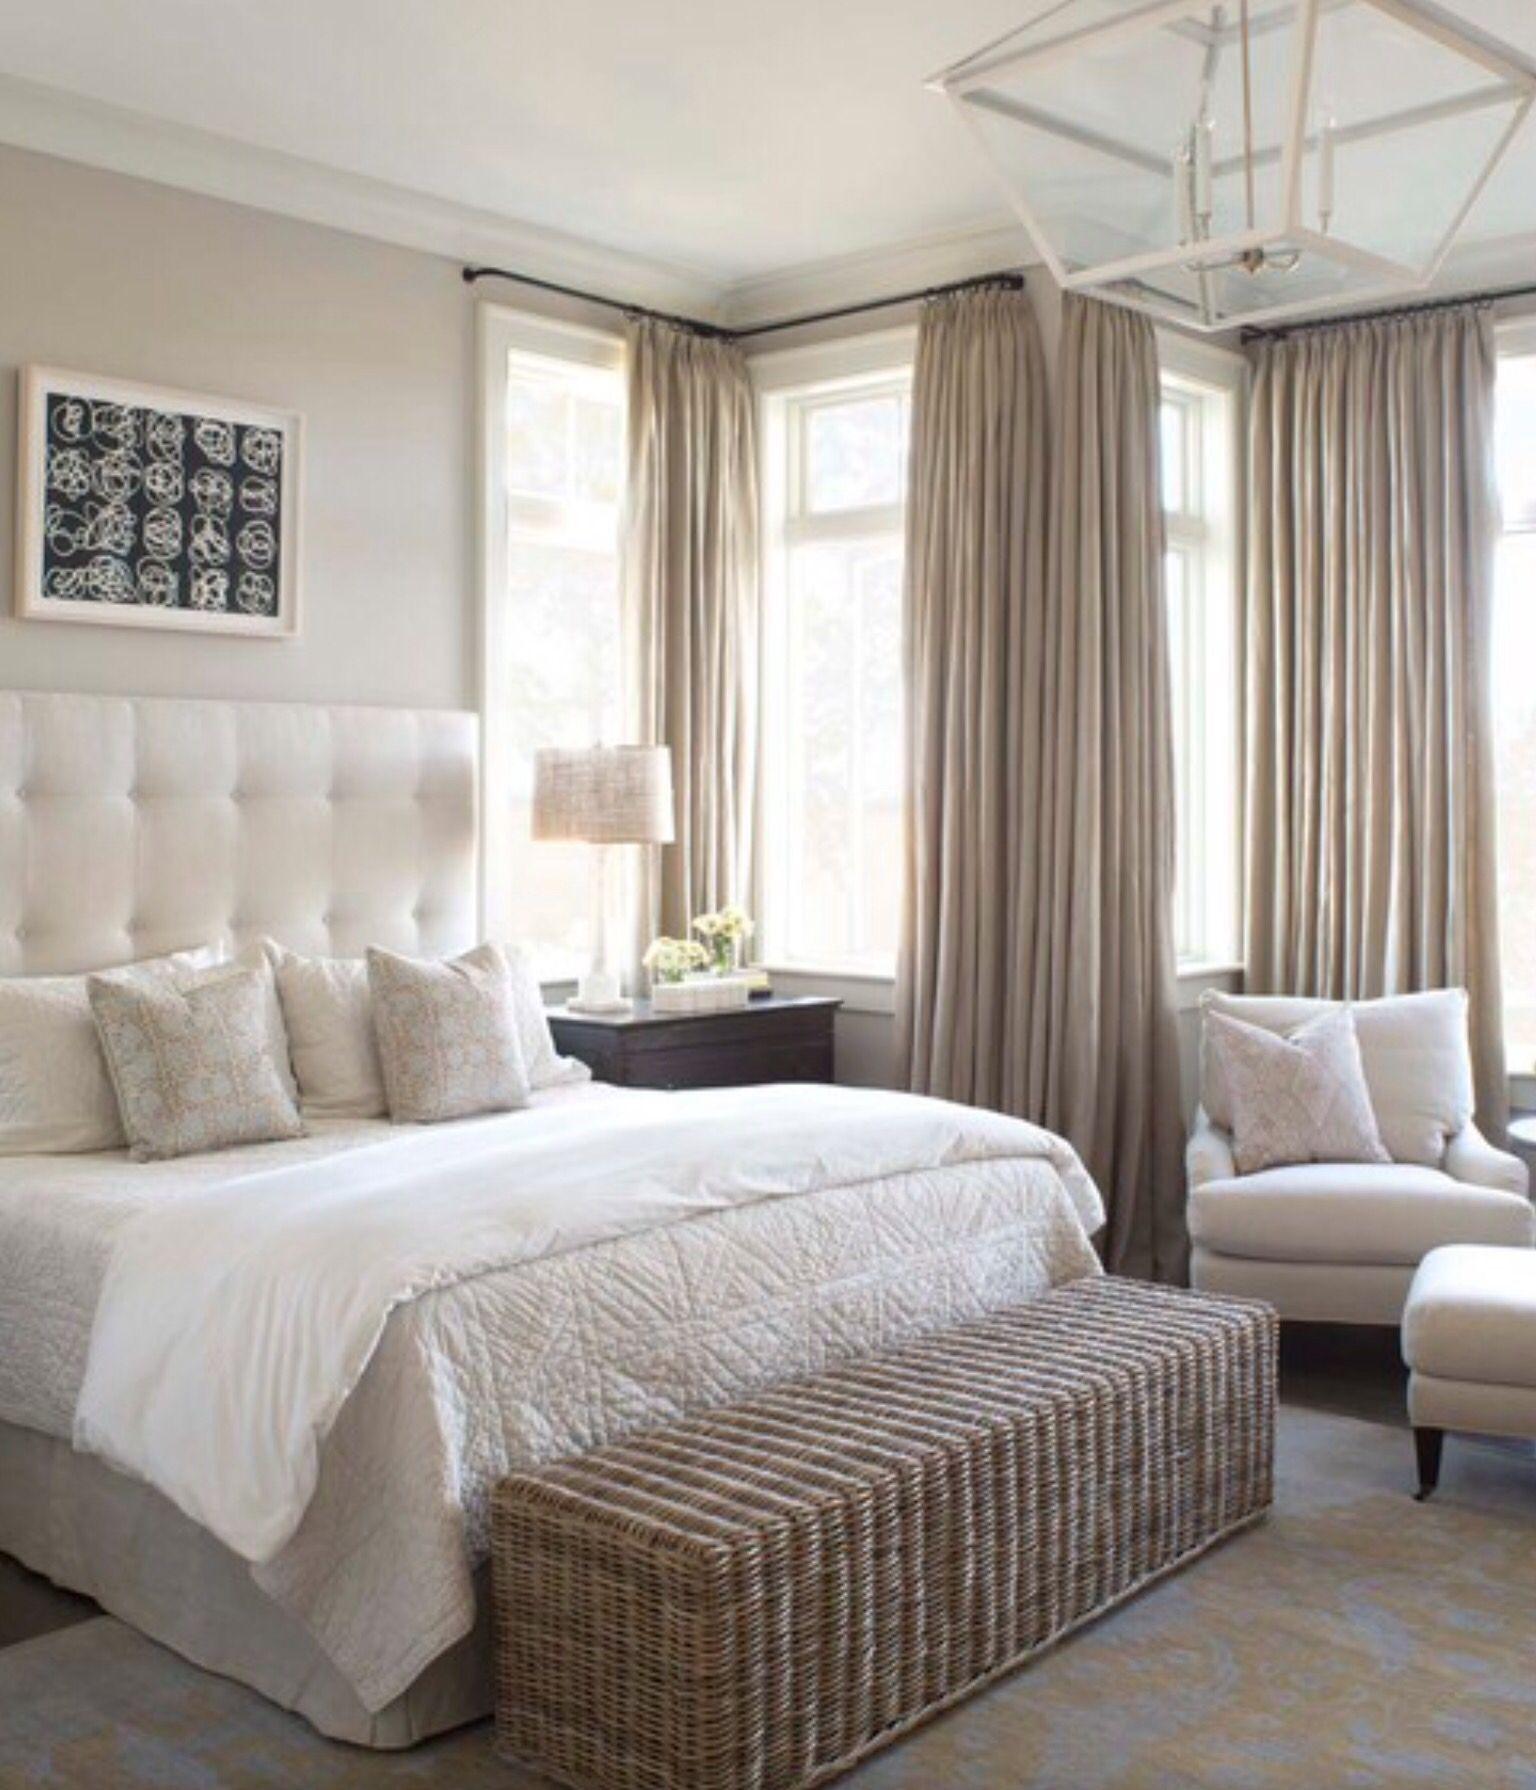 pinterest hannahashley07 cozy master bedroom bedroom on modern cozy bedroom decorating ideas id=25626